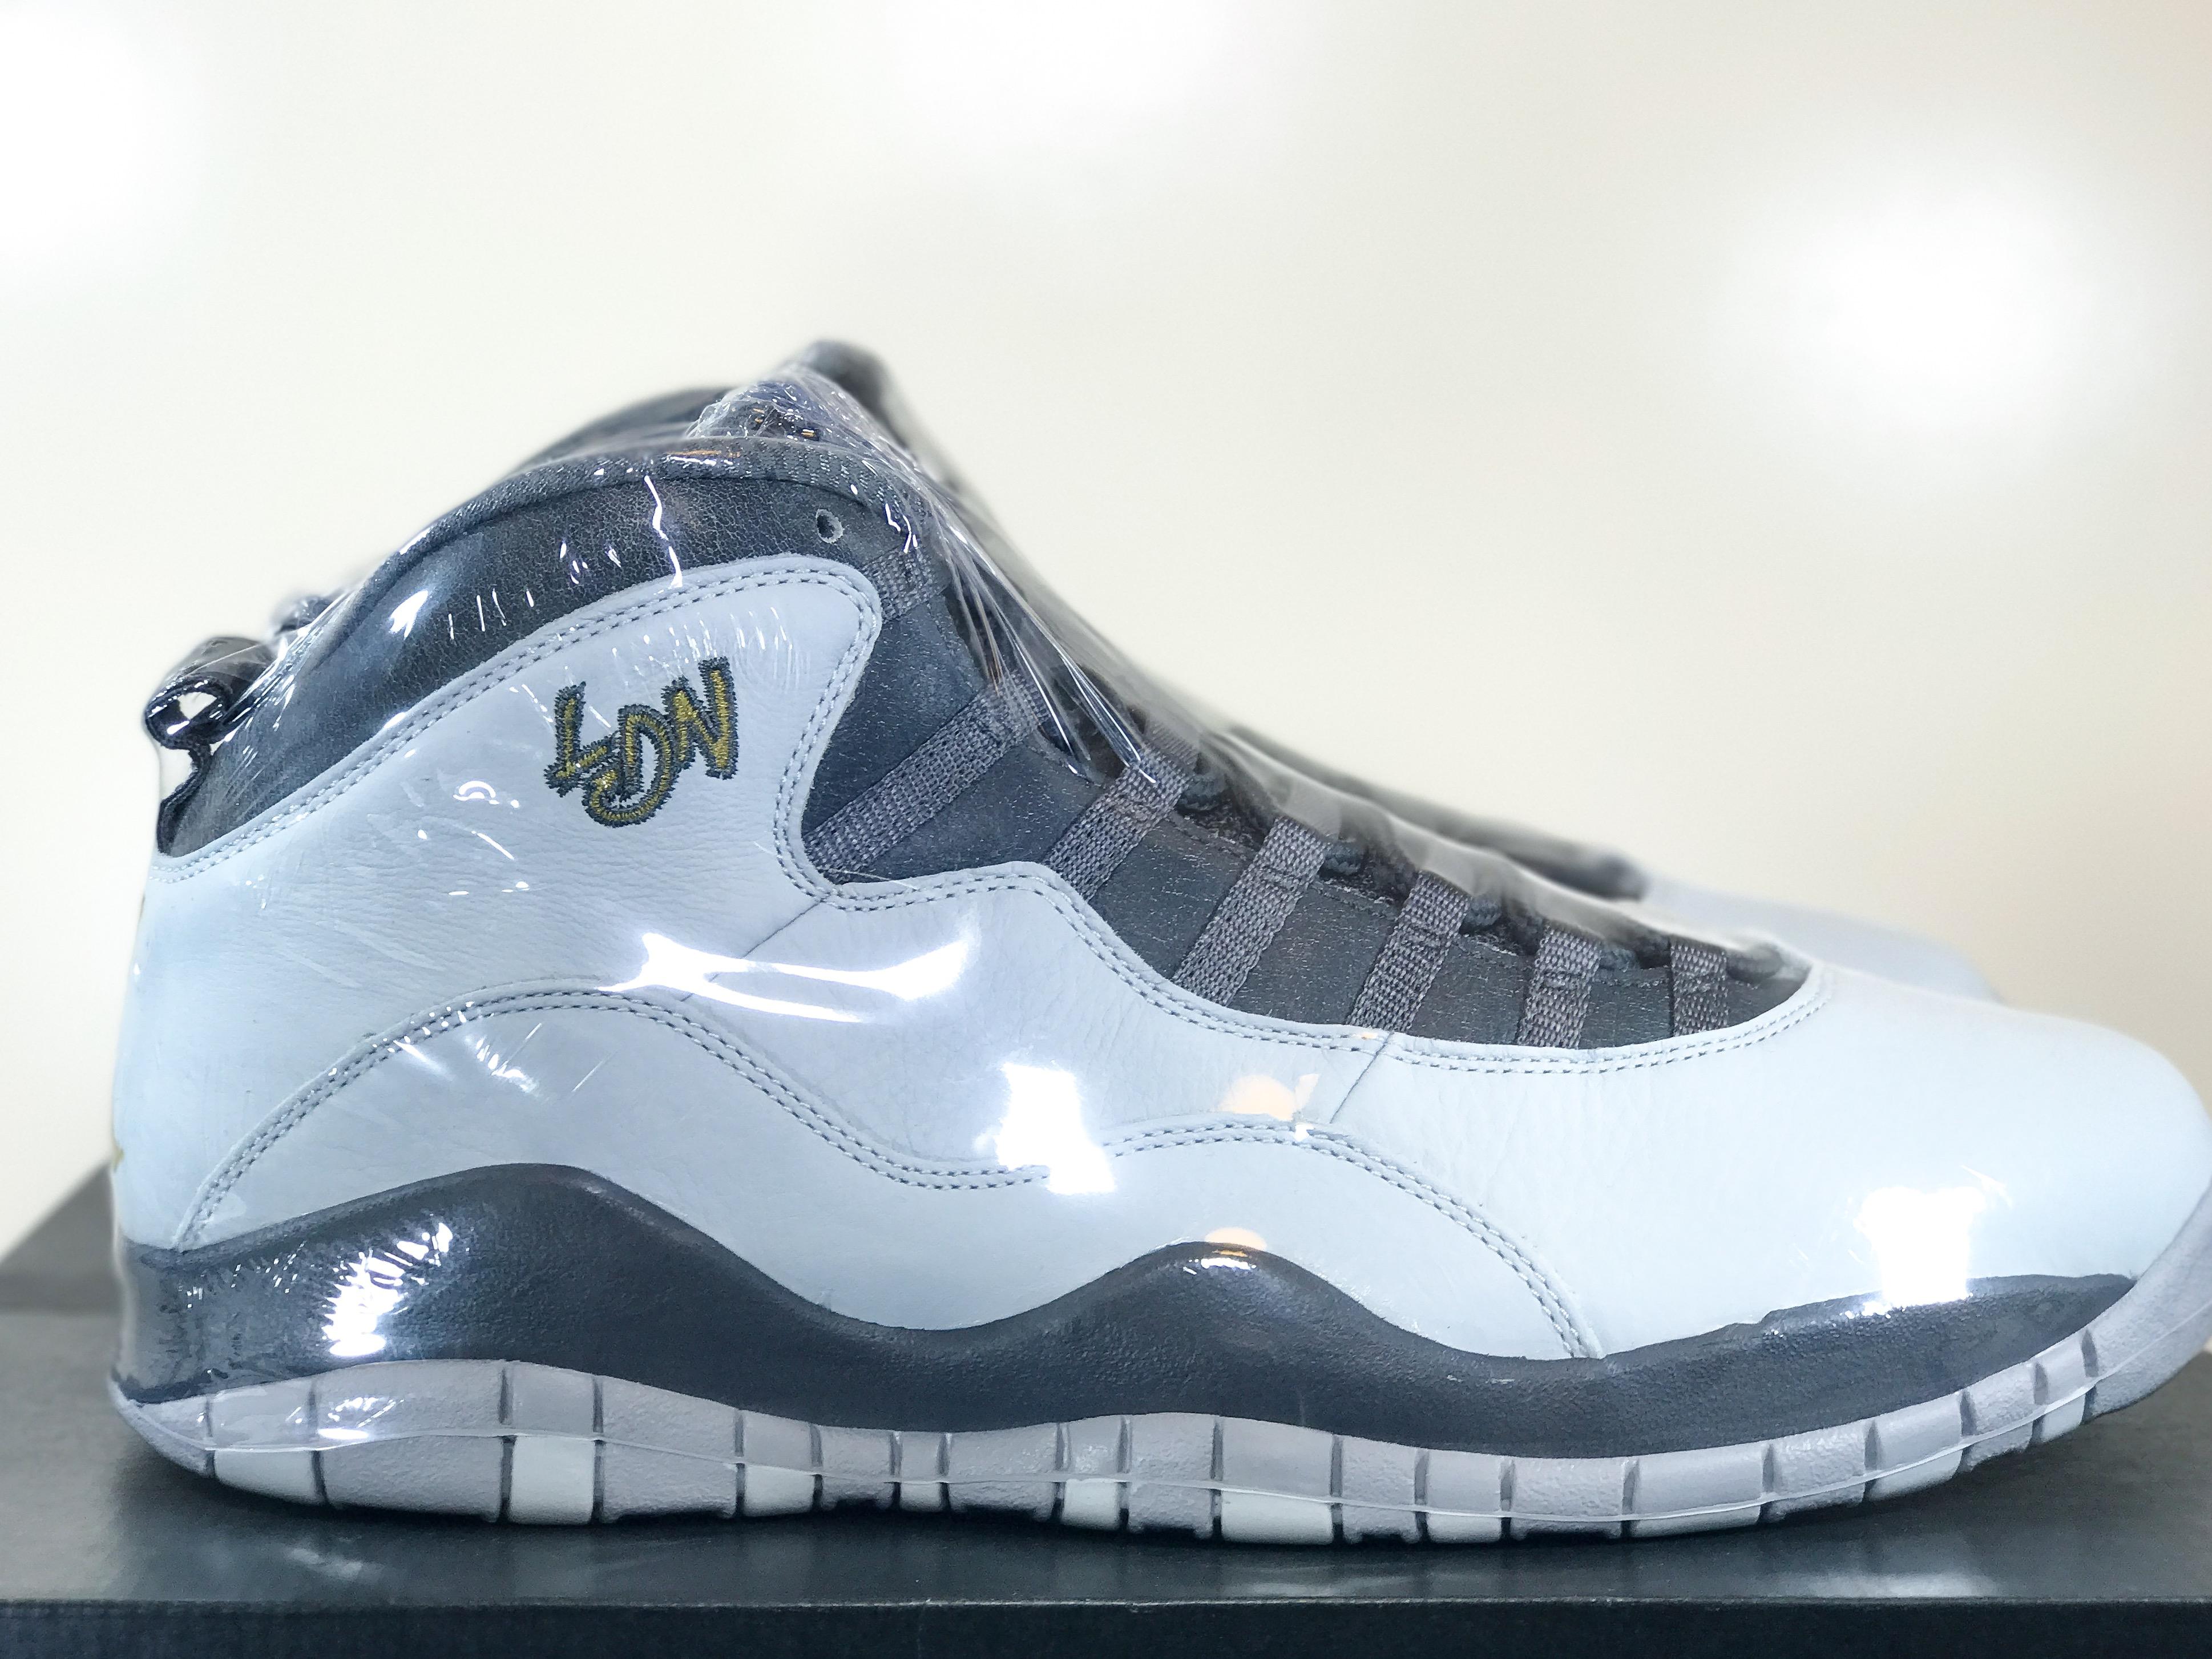 new style 7916c e4dfe Air Jordan Retro 10